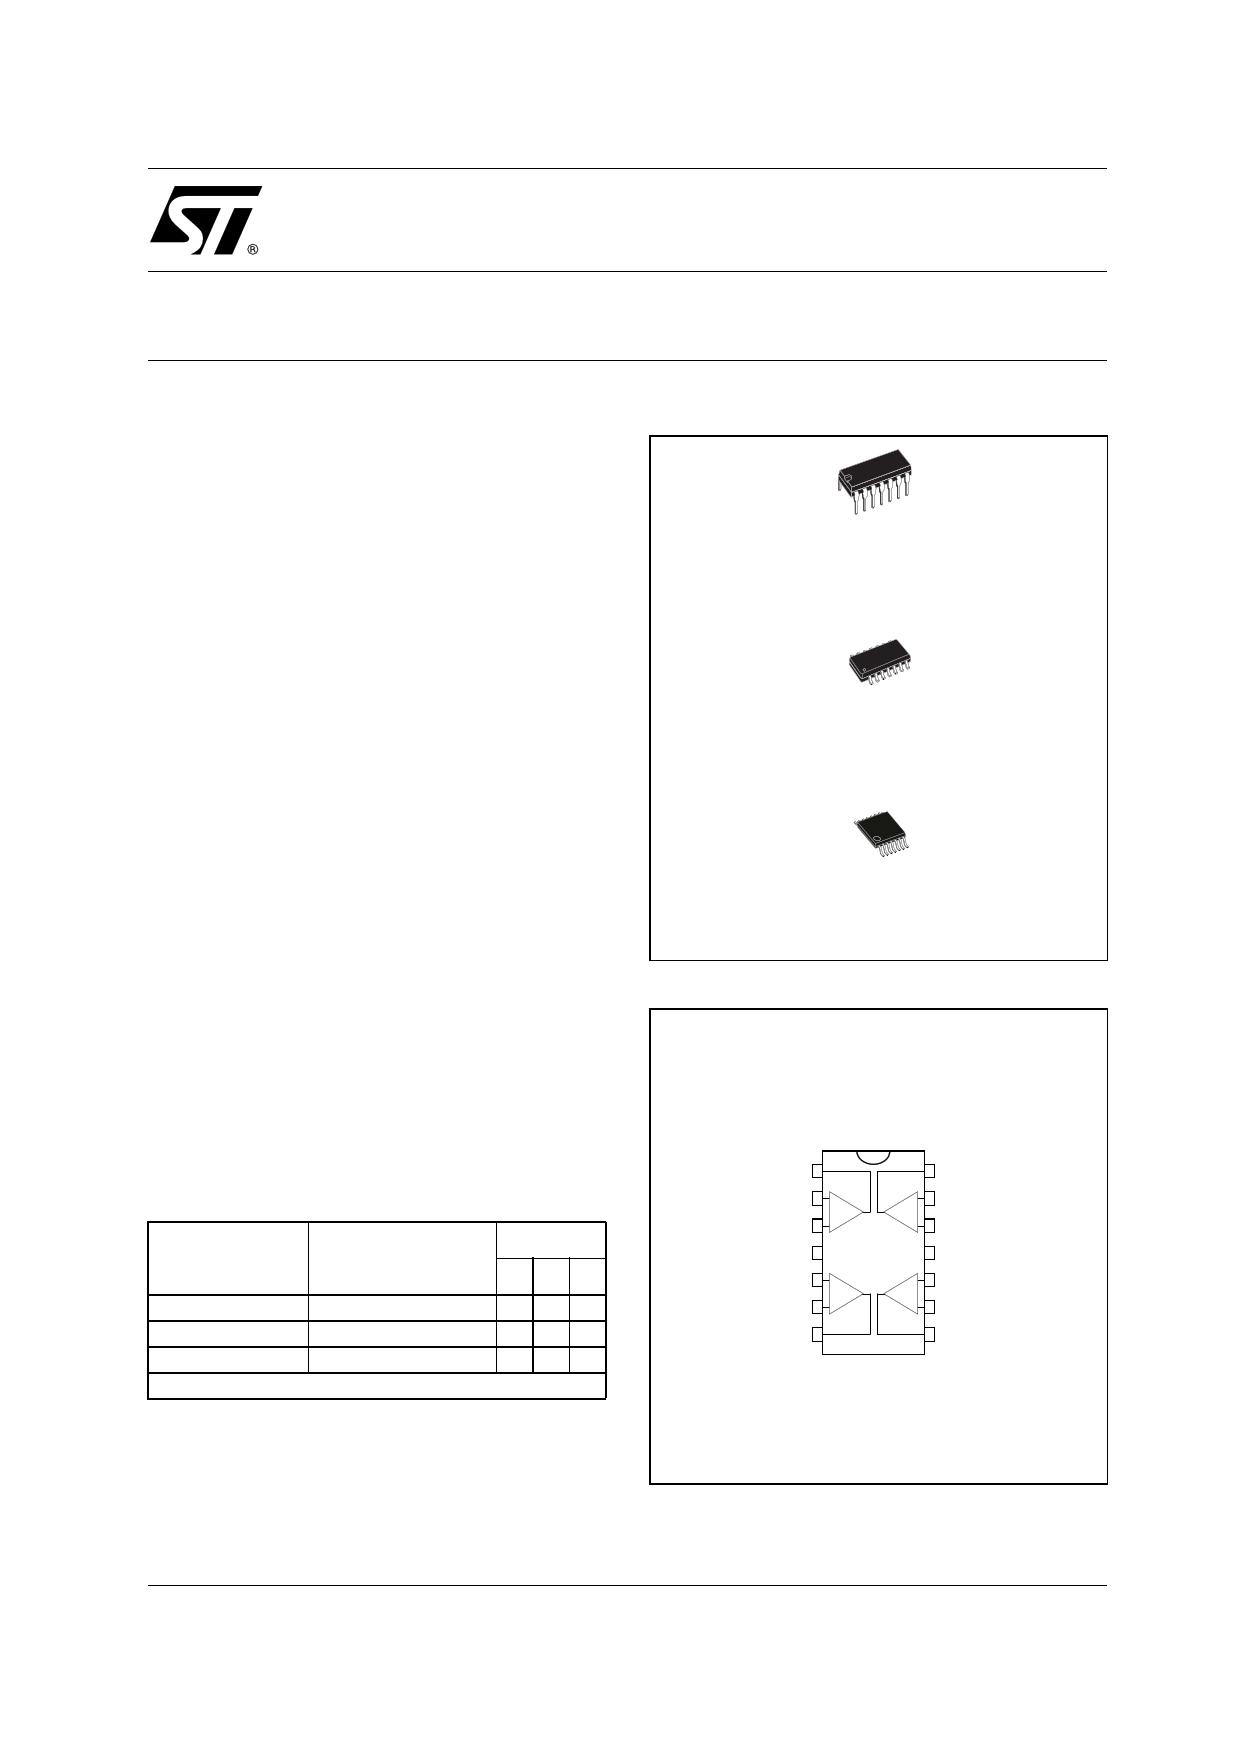 TS27L4AI Datasheet, TS27L4AI PDF,ピン配置, 機能